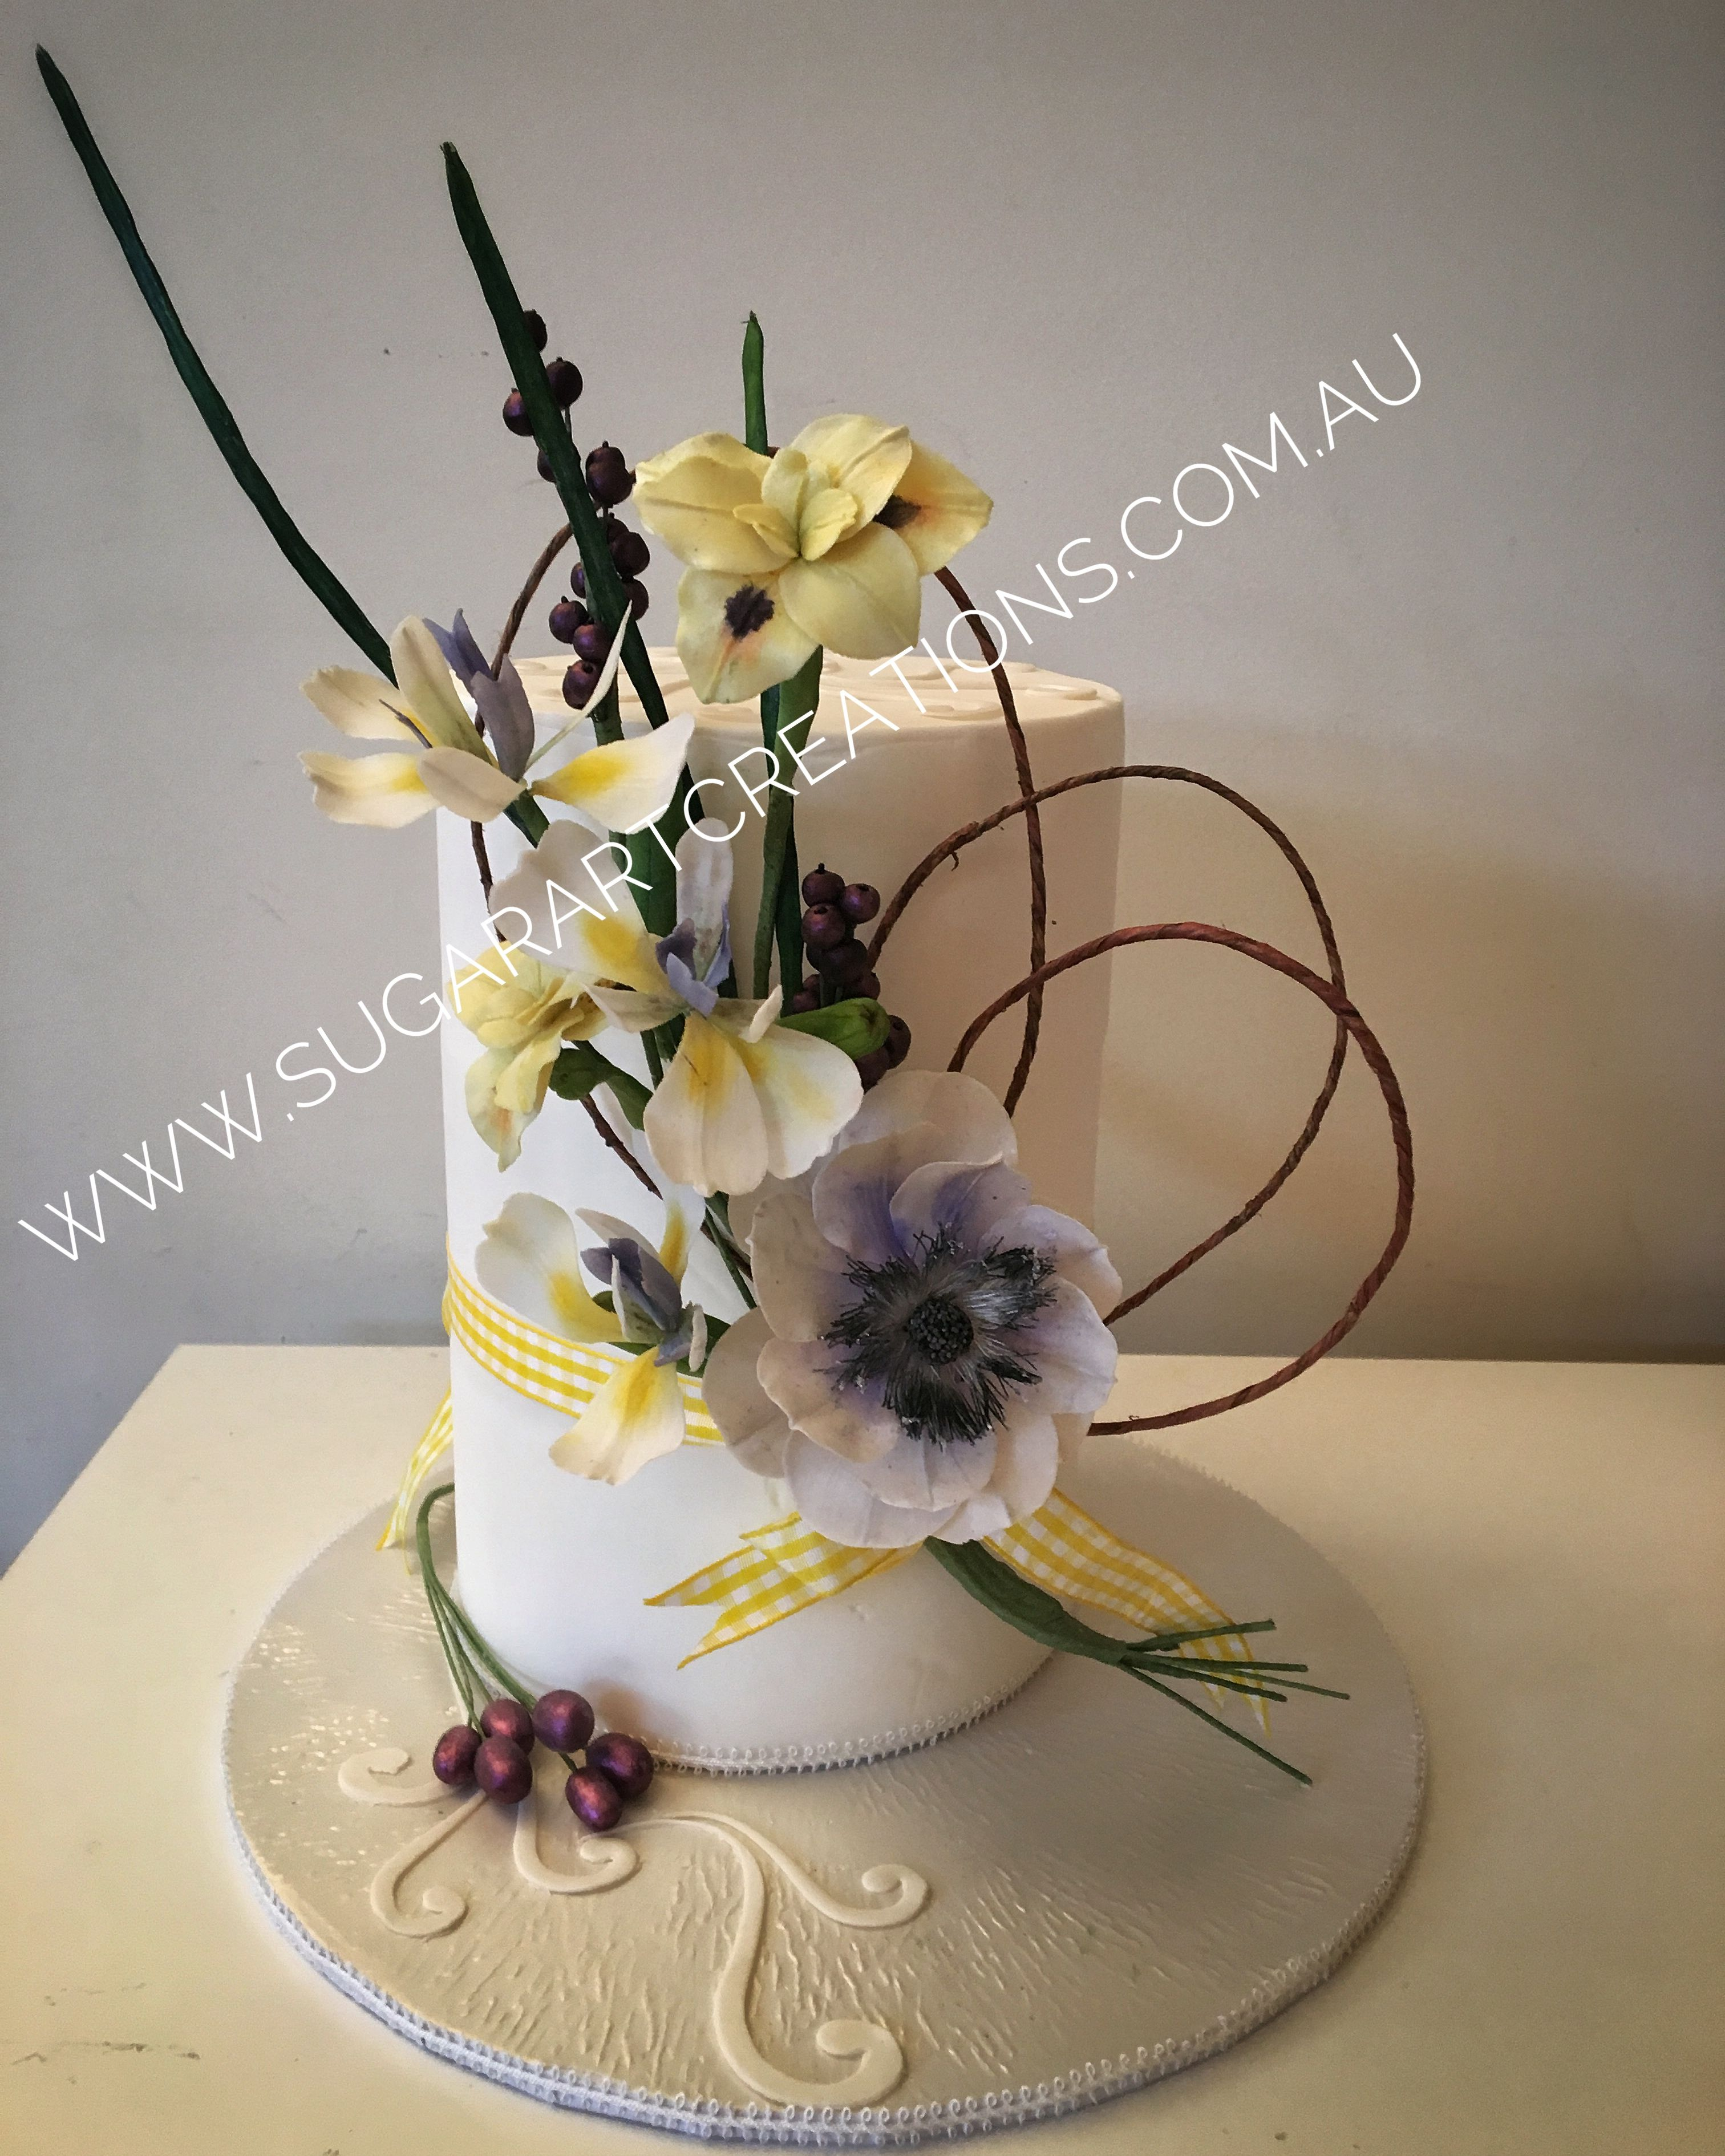 Sugarartcreations sugar flower chic cakes by helen pinterest